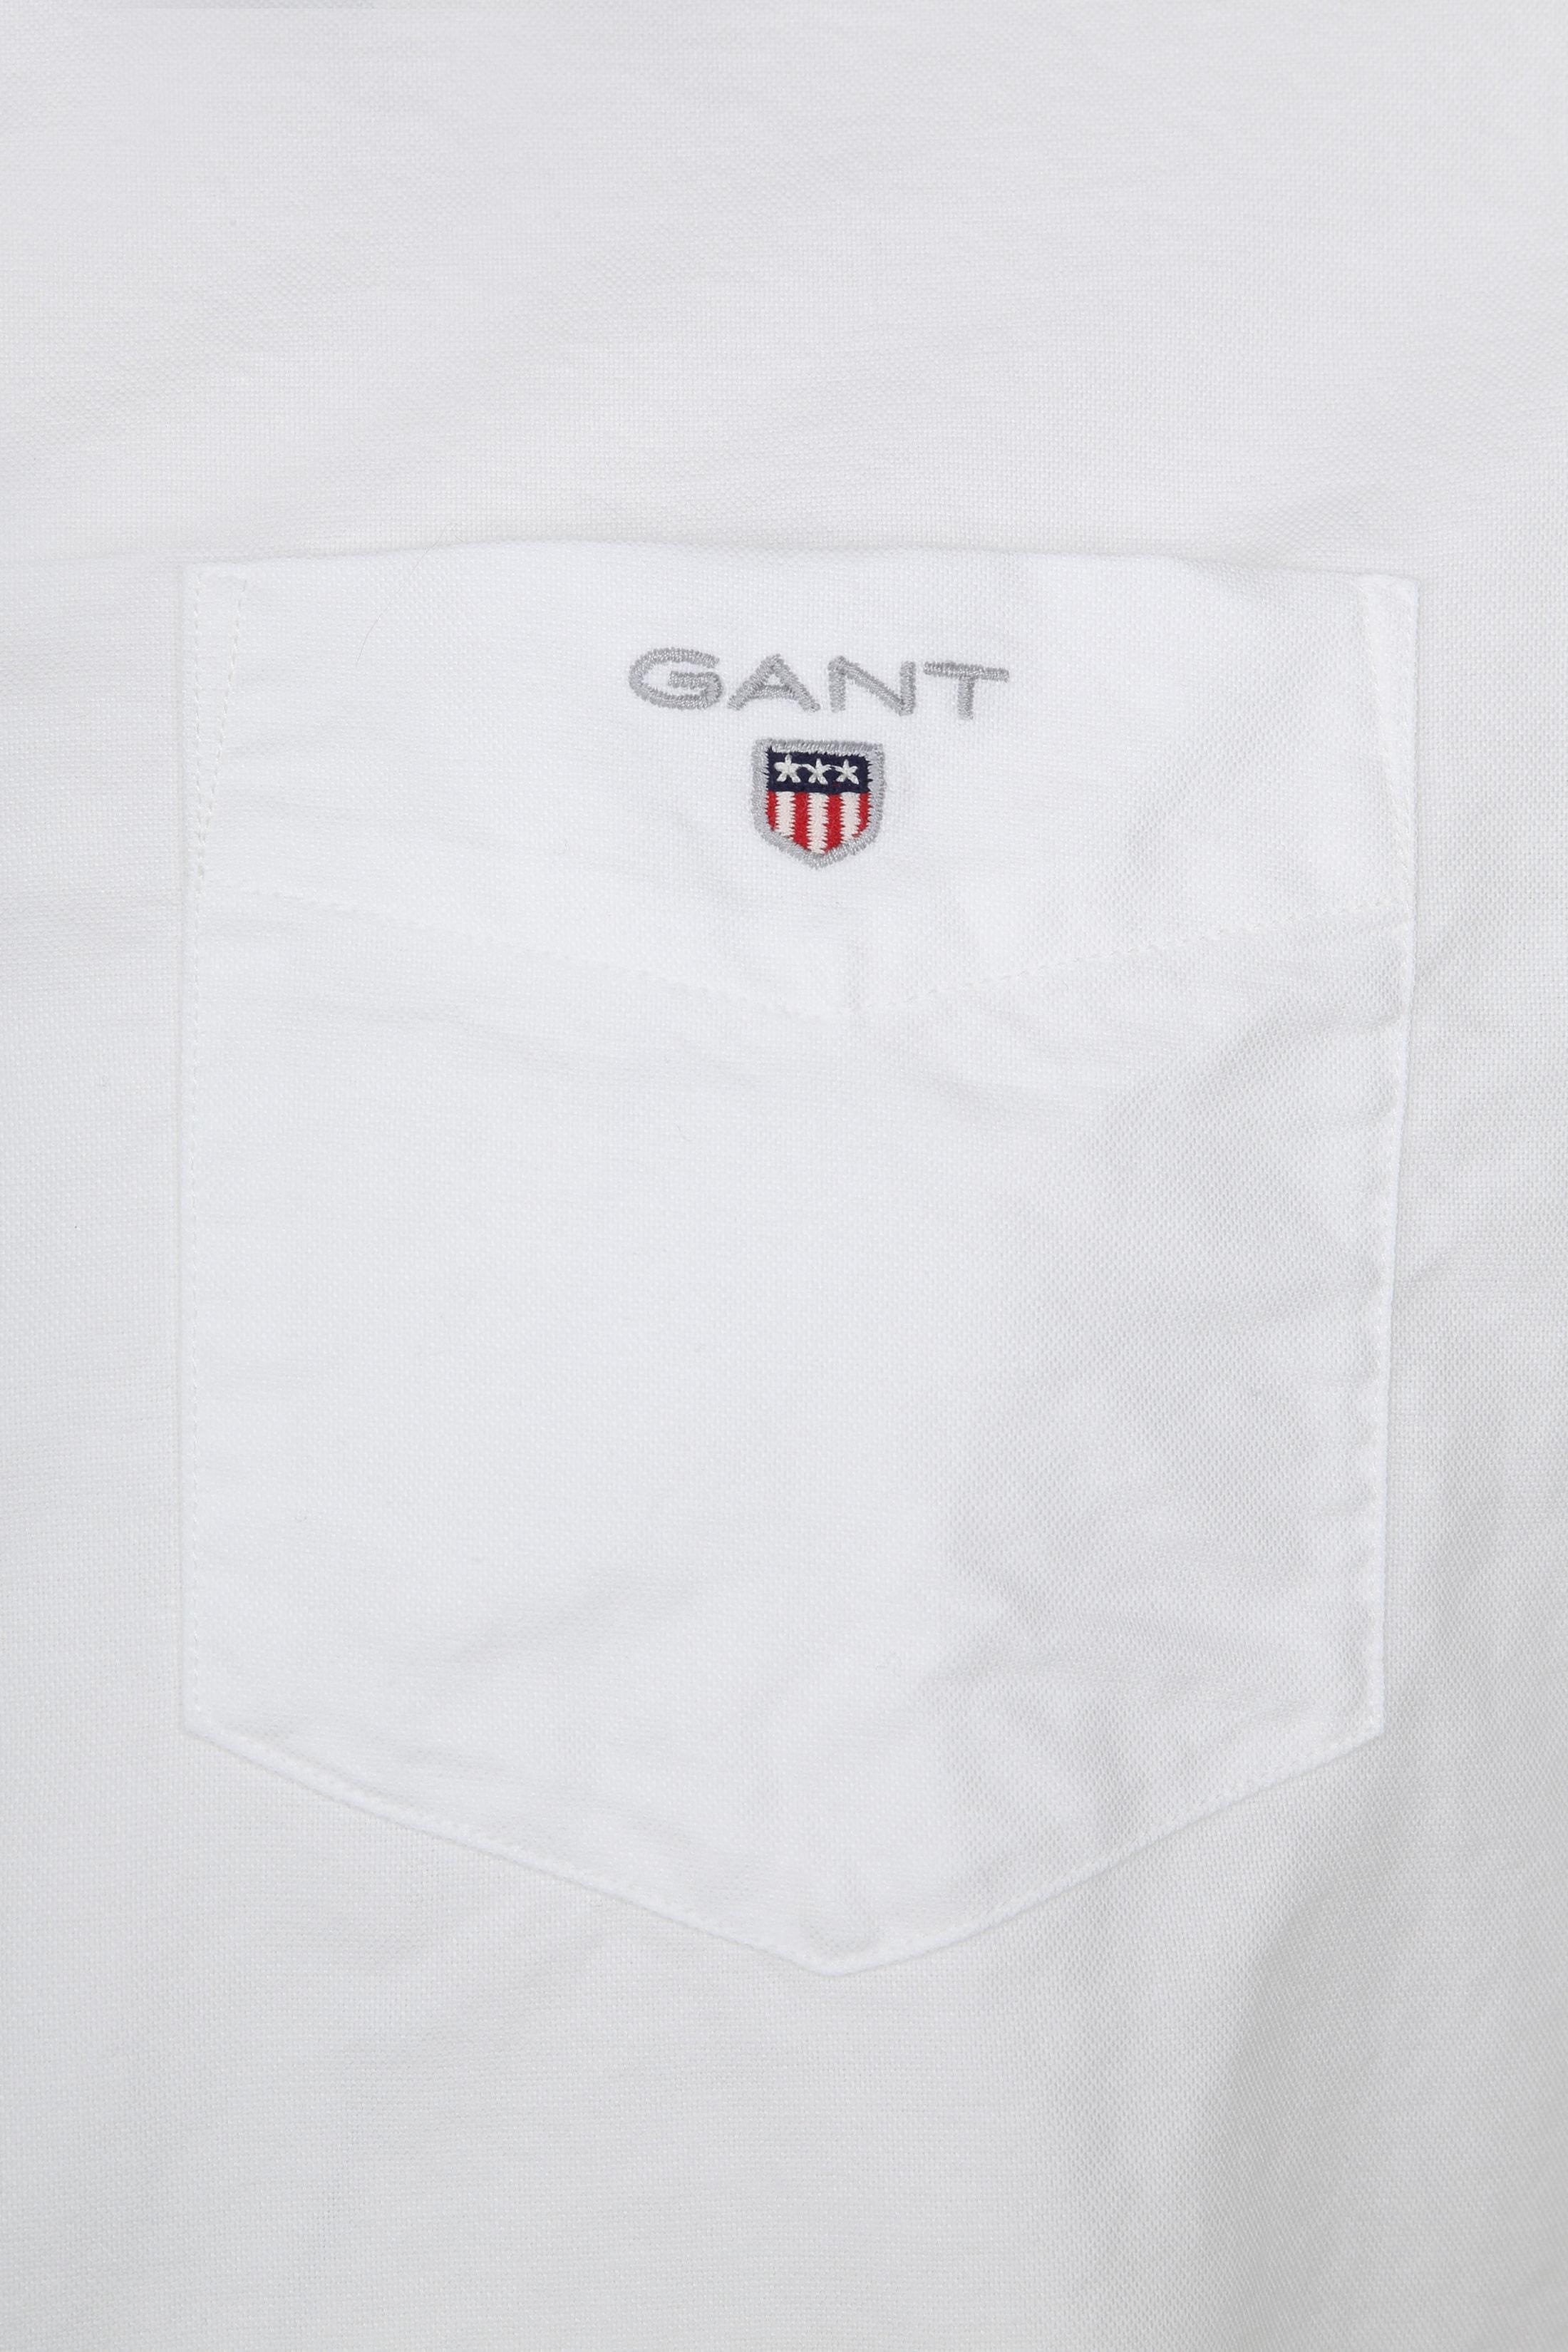 Gant Casual Shirt Oxford White foto 1